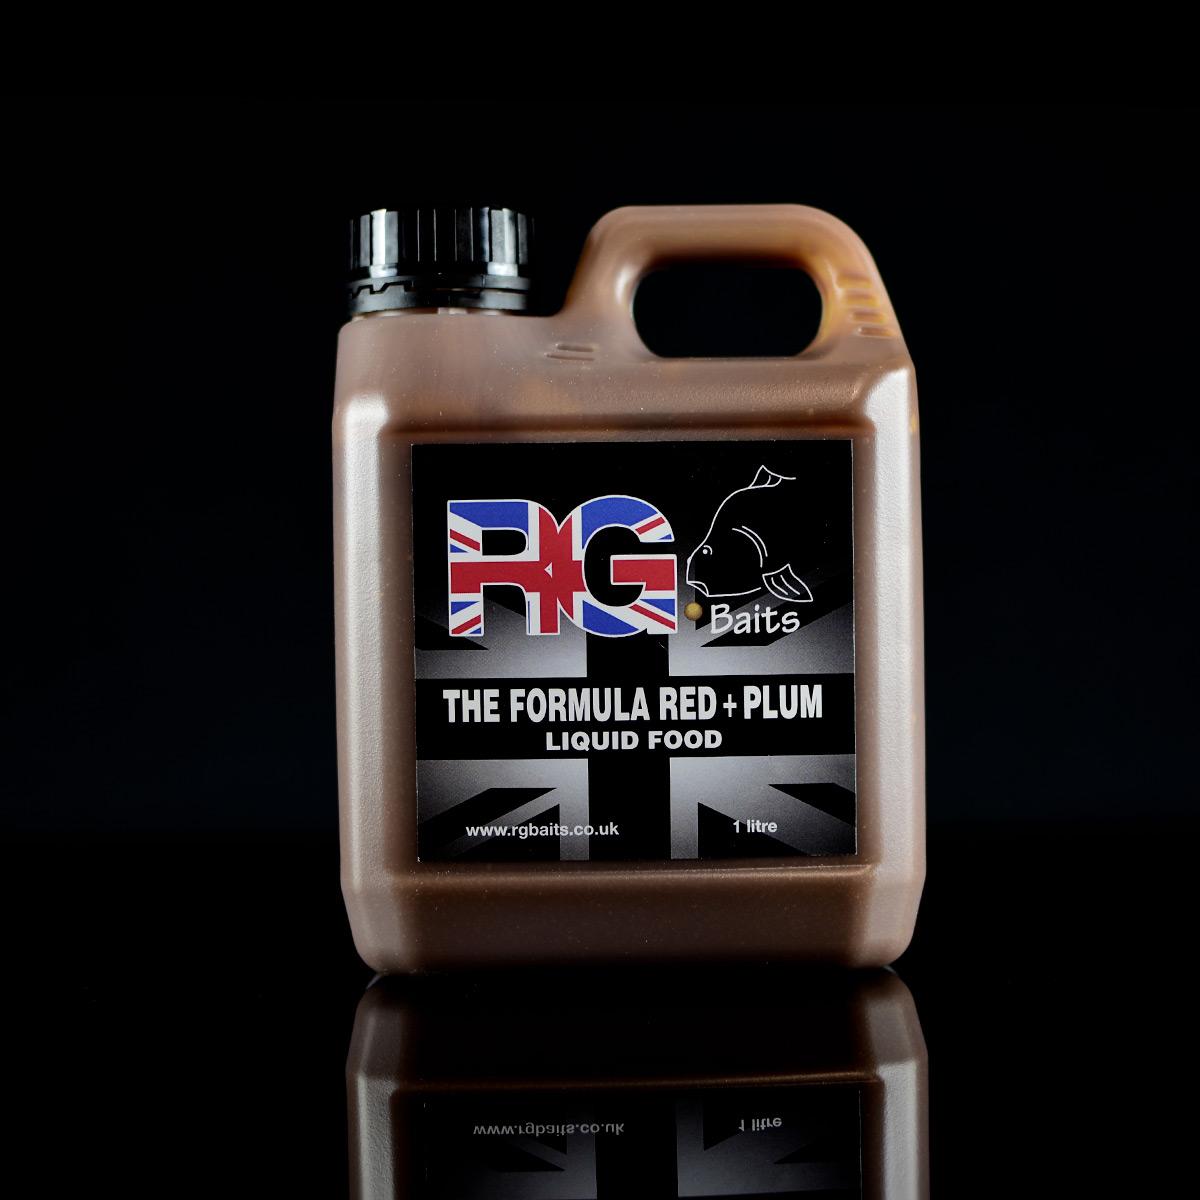 The Formula Red + NI Plum Liquid Food